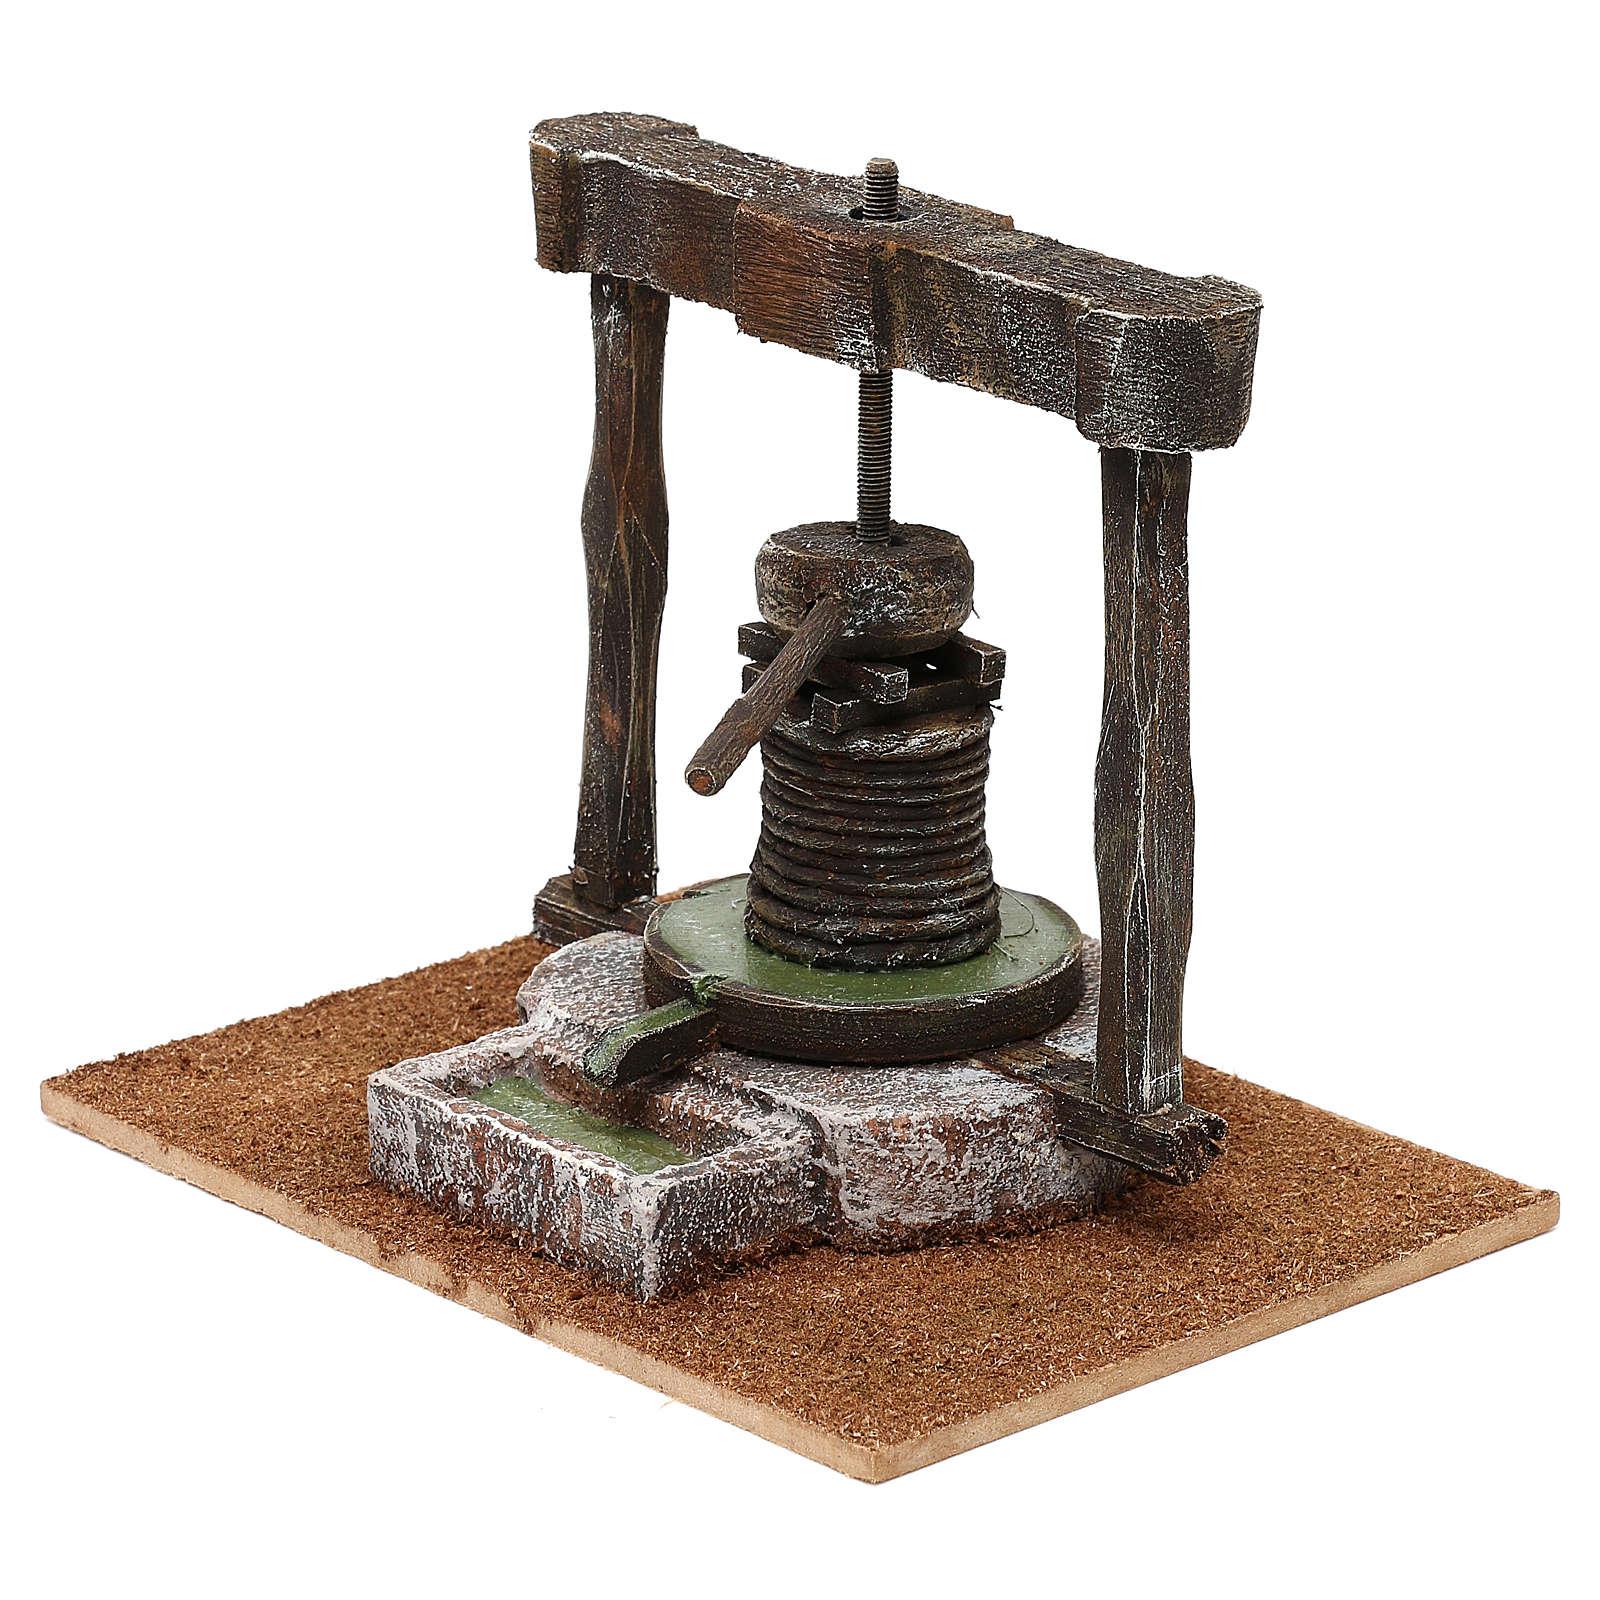 Torchio legno resina presepe 12 cm 15x15x20 cm 4